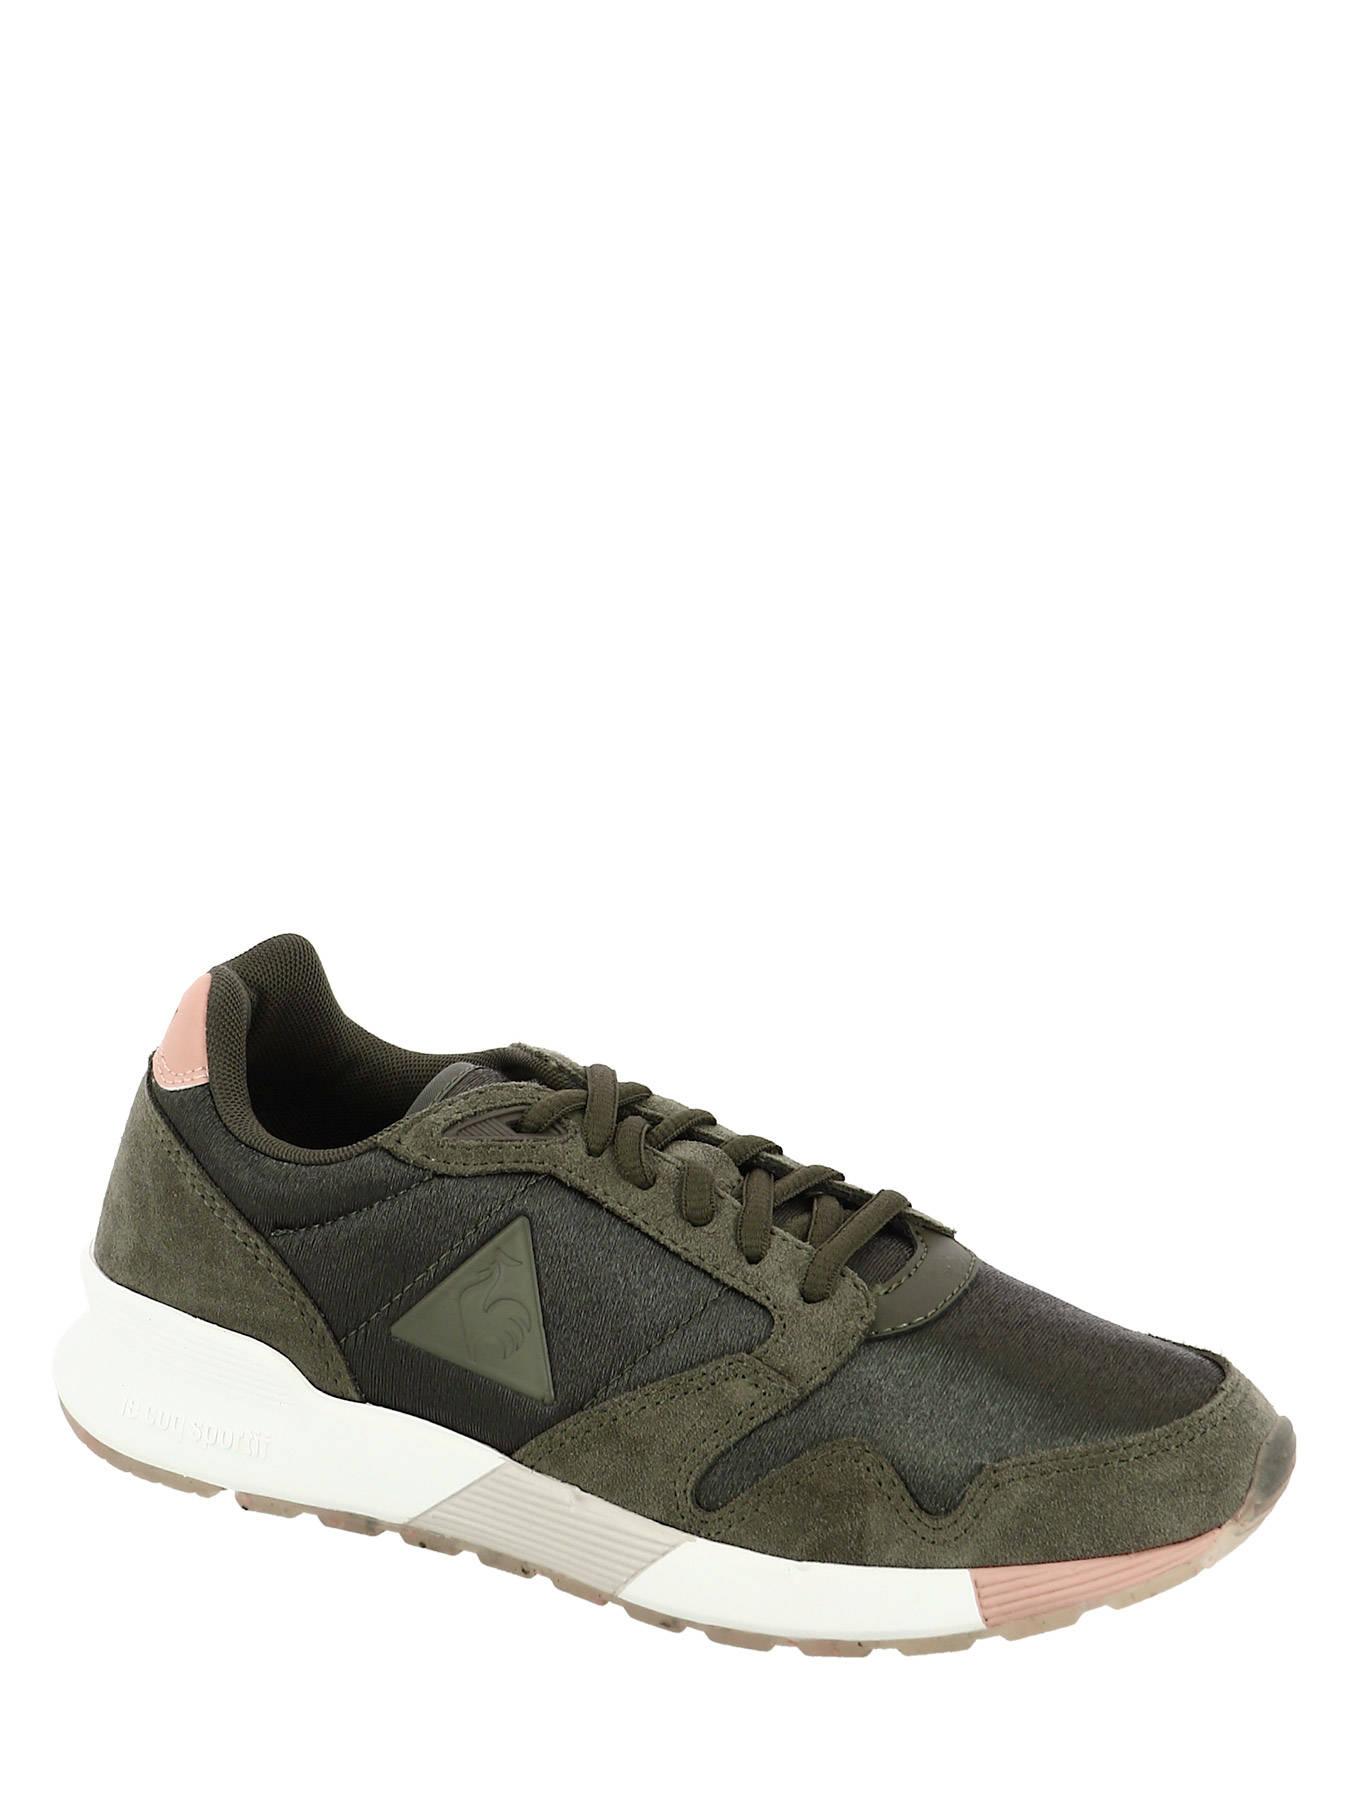 19f1487a80 Le Coq Sportif Sneakers OMEGA X W SPORT on edisac.com